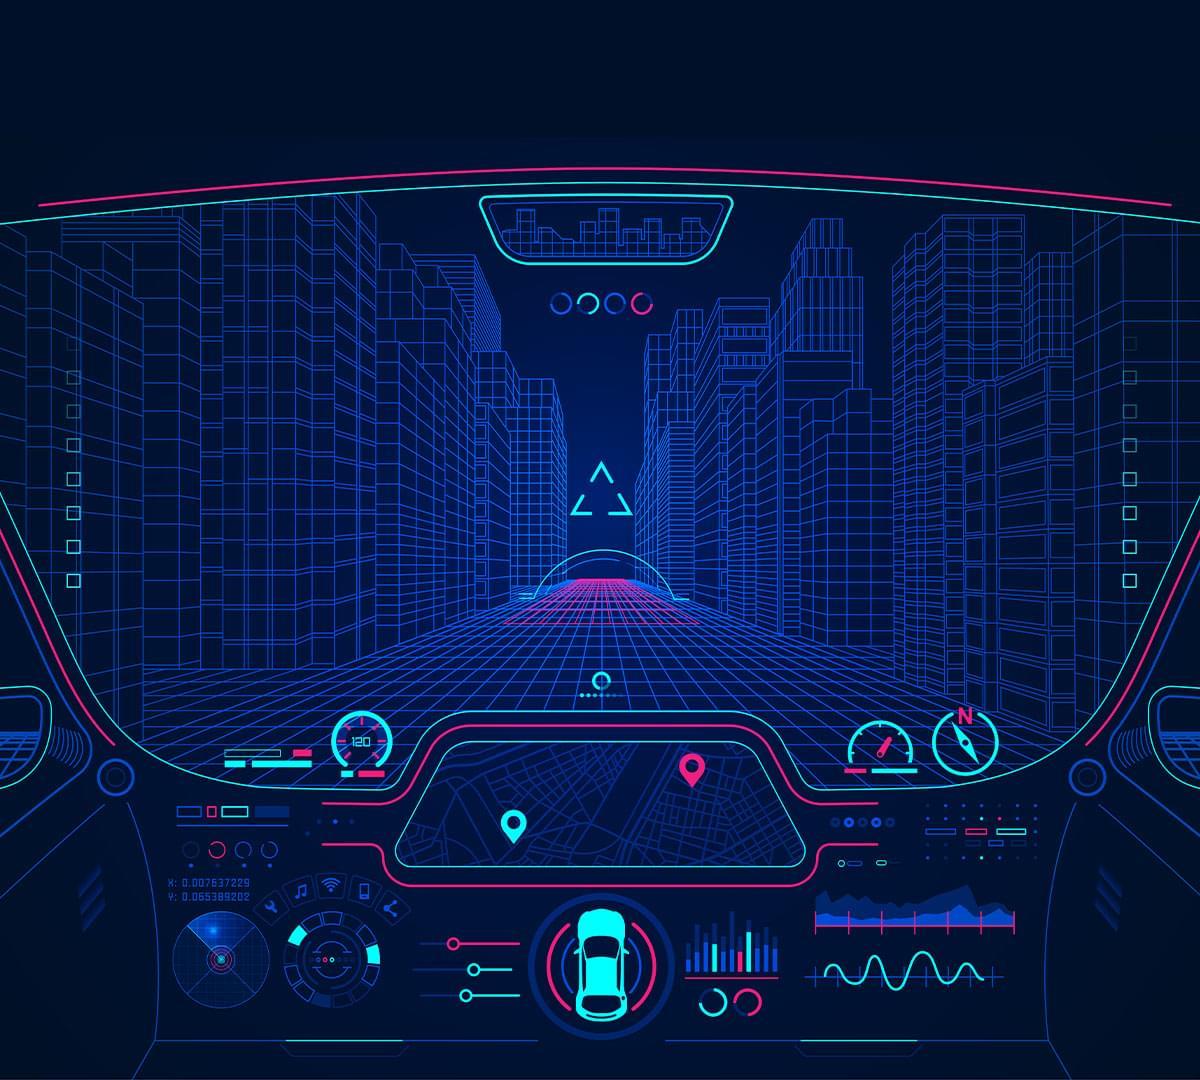 Image Sensors Auto Americas